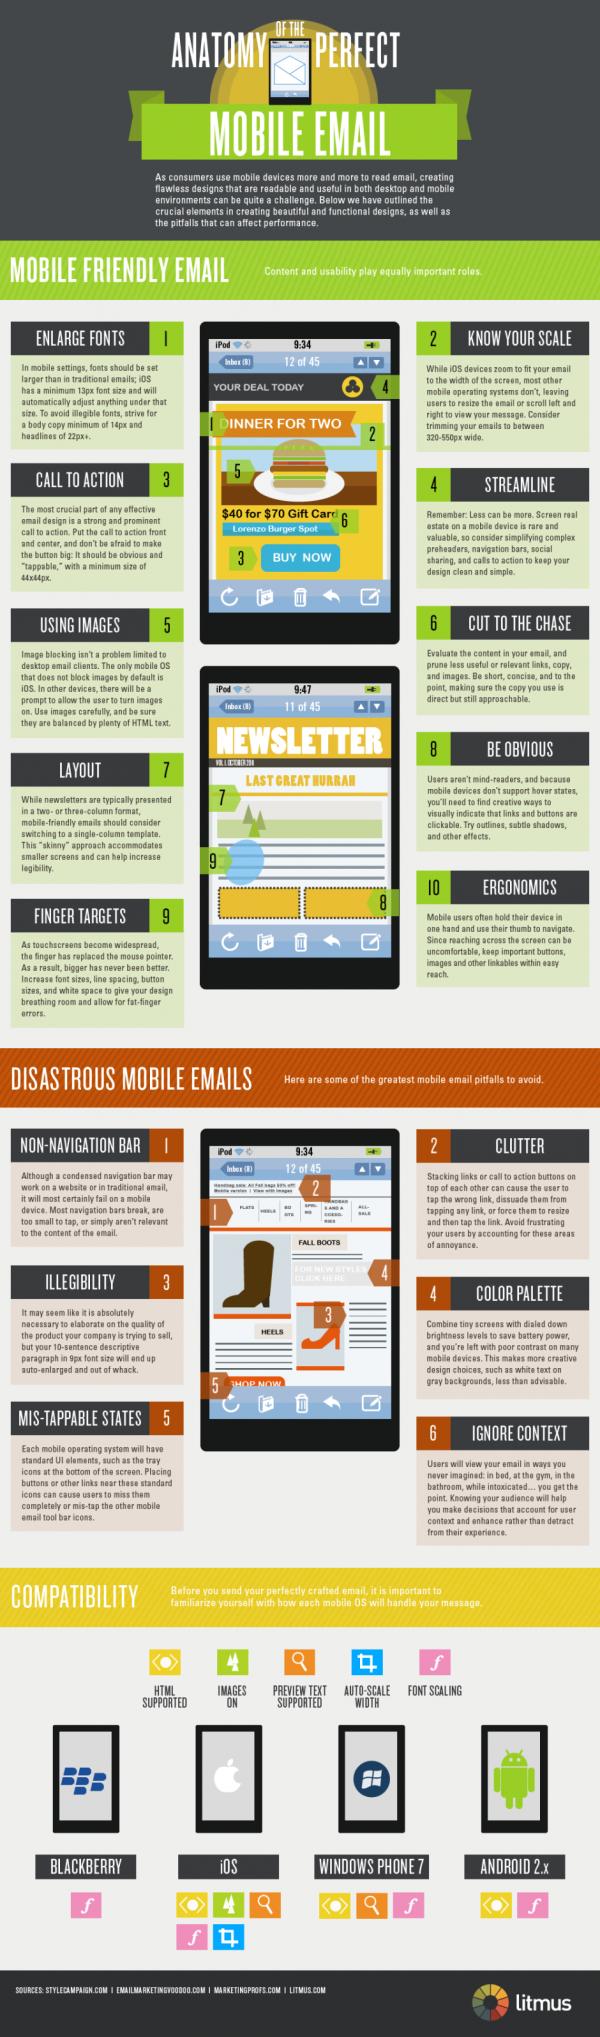 mobile e-mail marketing